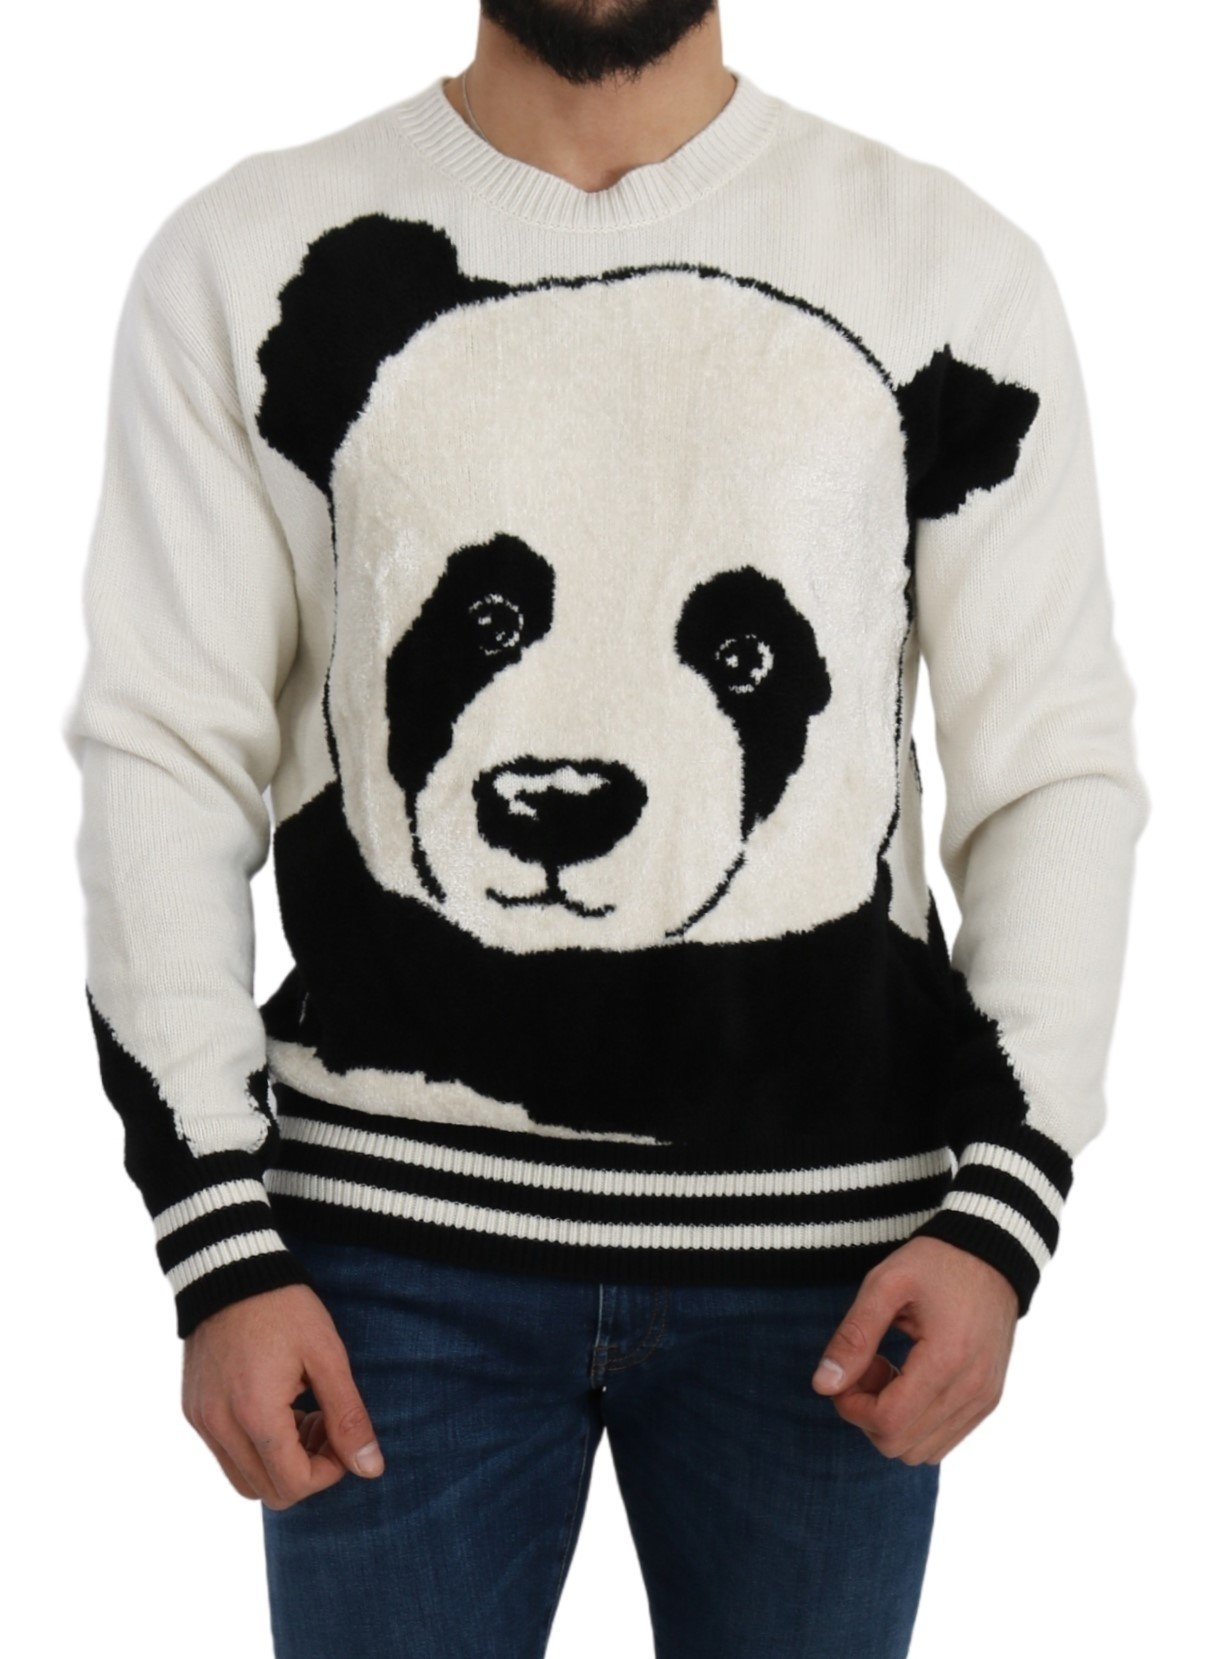 Dolce & Gabbana Men's Cashmere Panda Knit Sweater White TSH5210 - IT48 | M